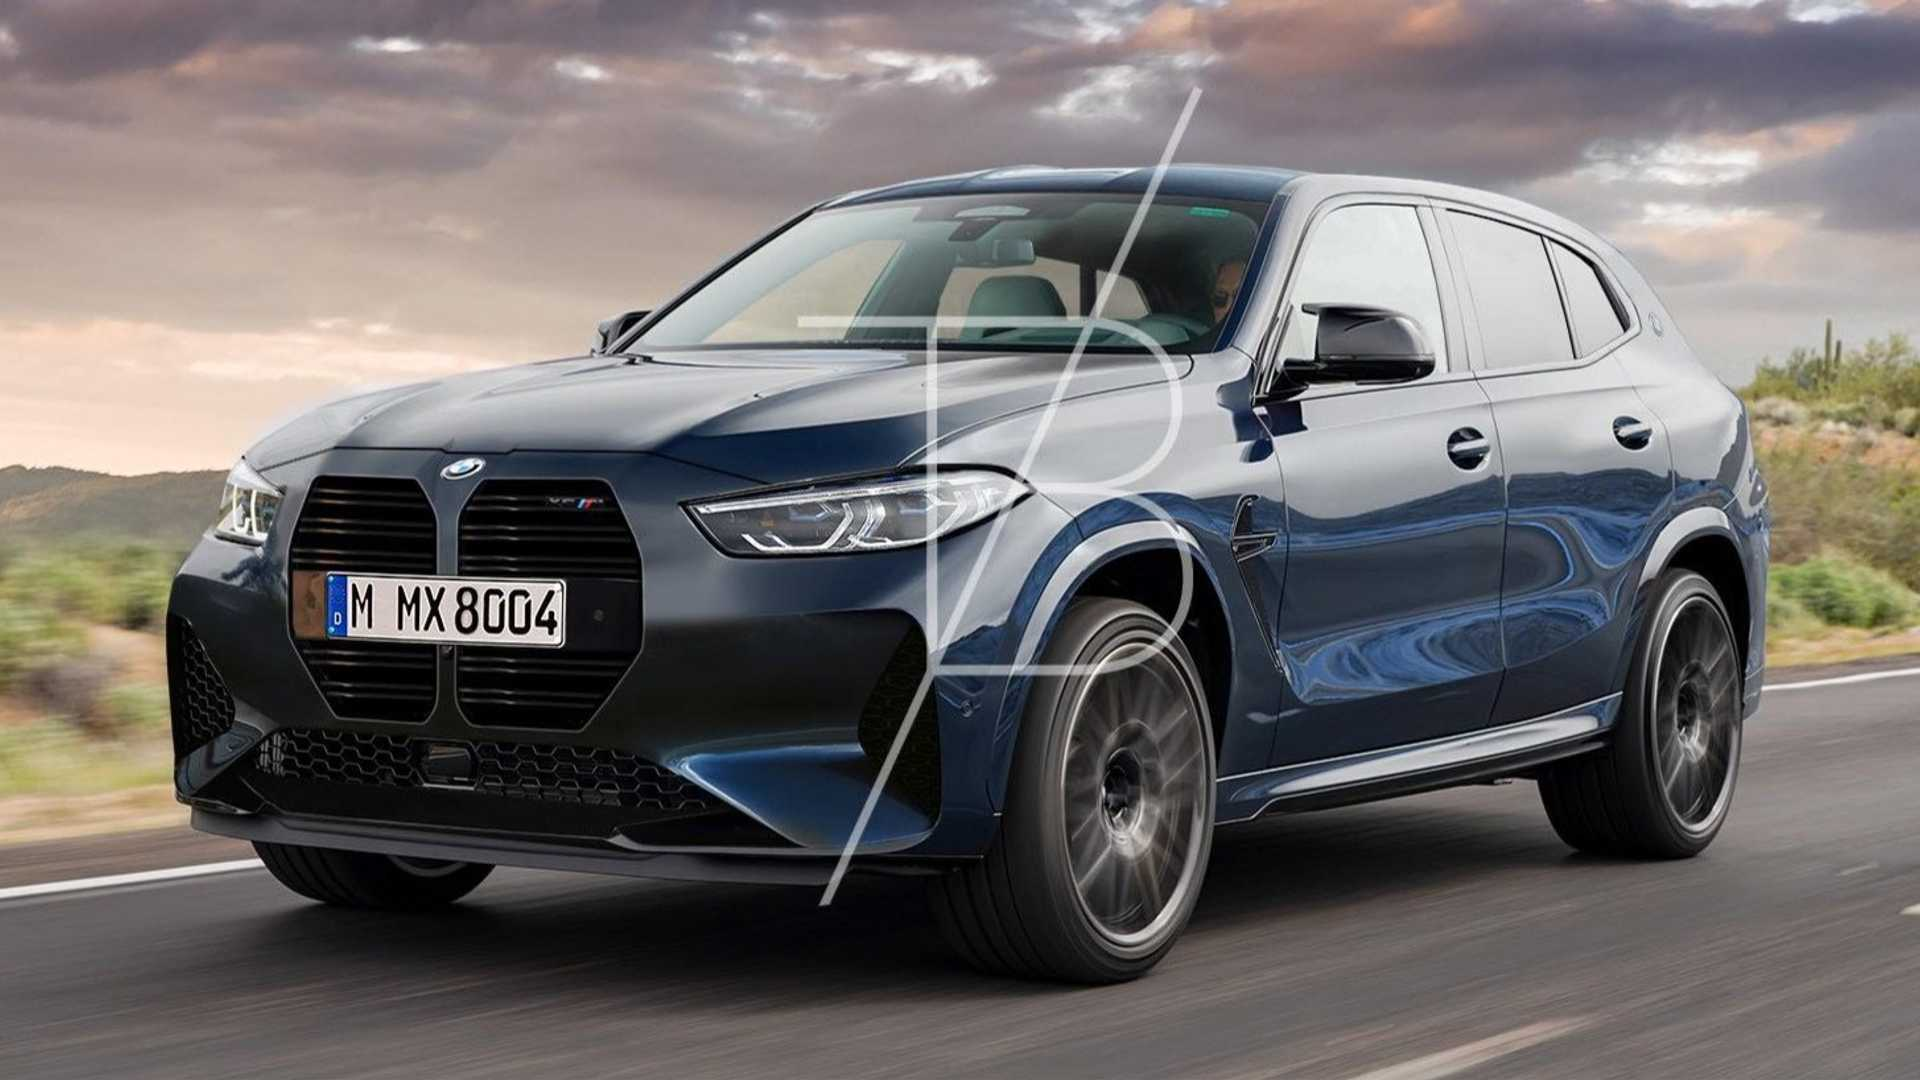 В интернете опубликовали рендер BMW X8 M